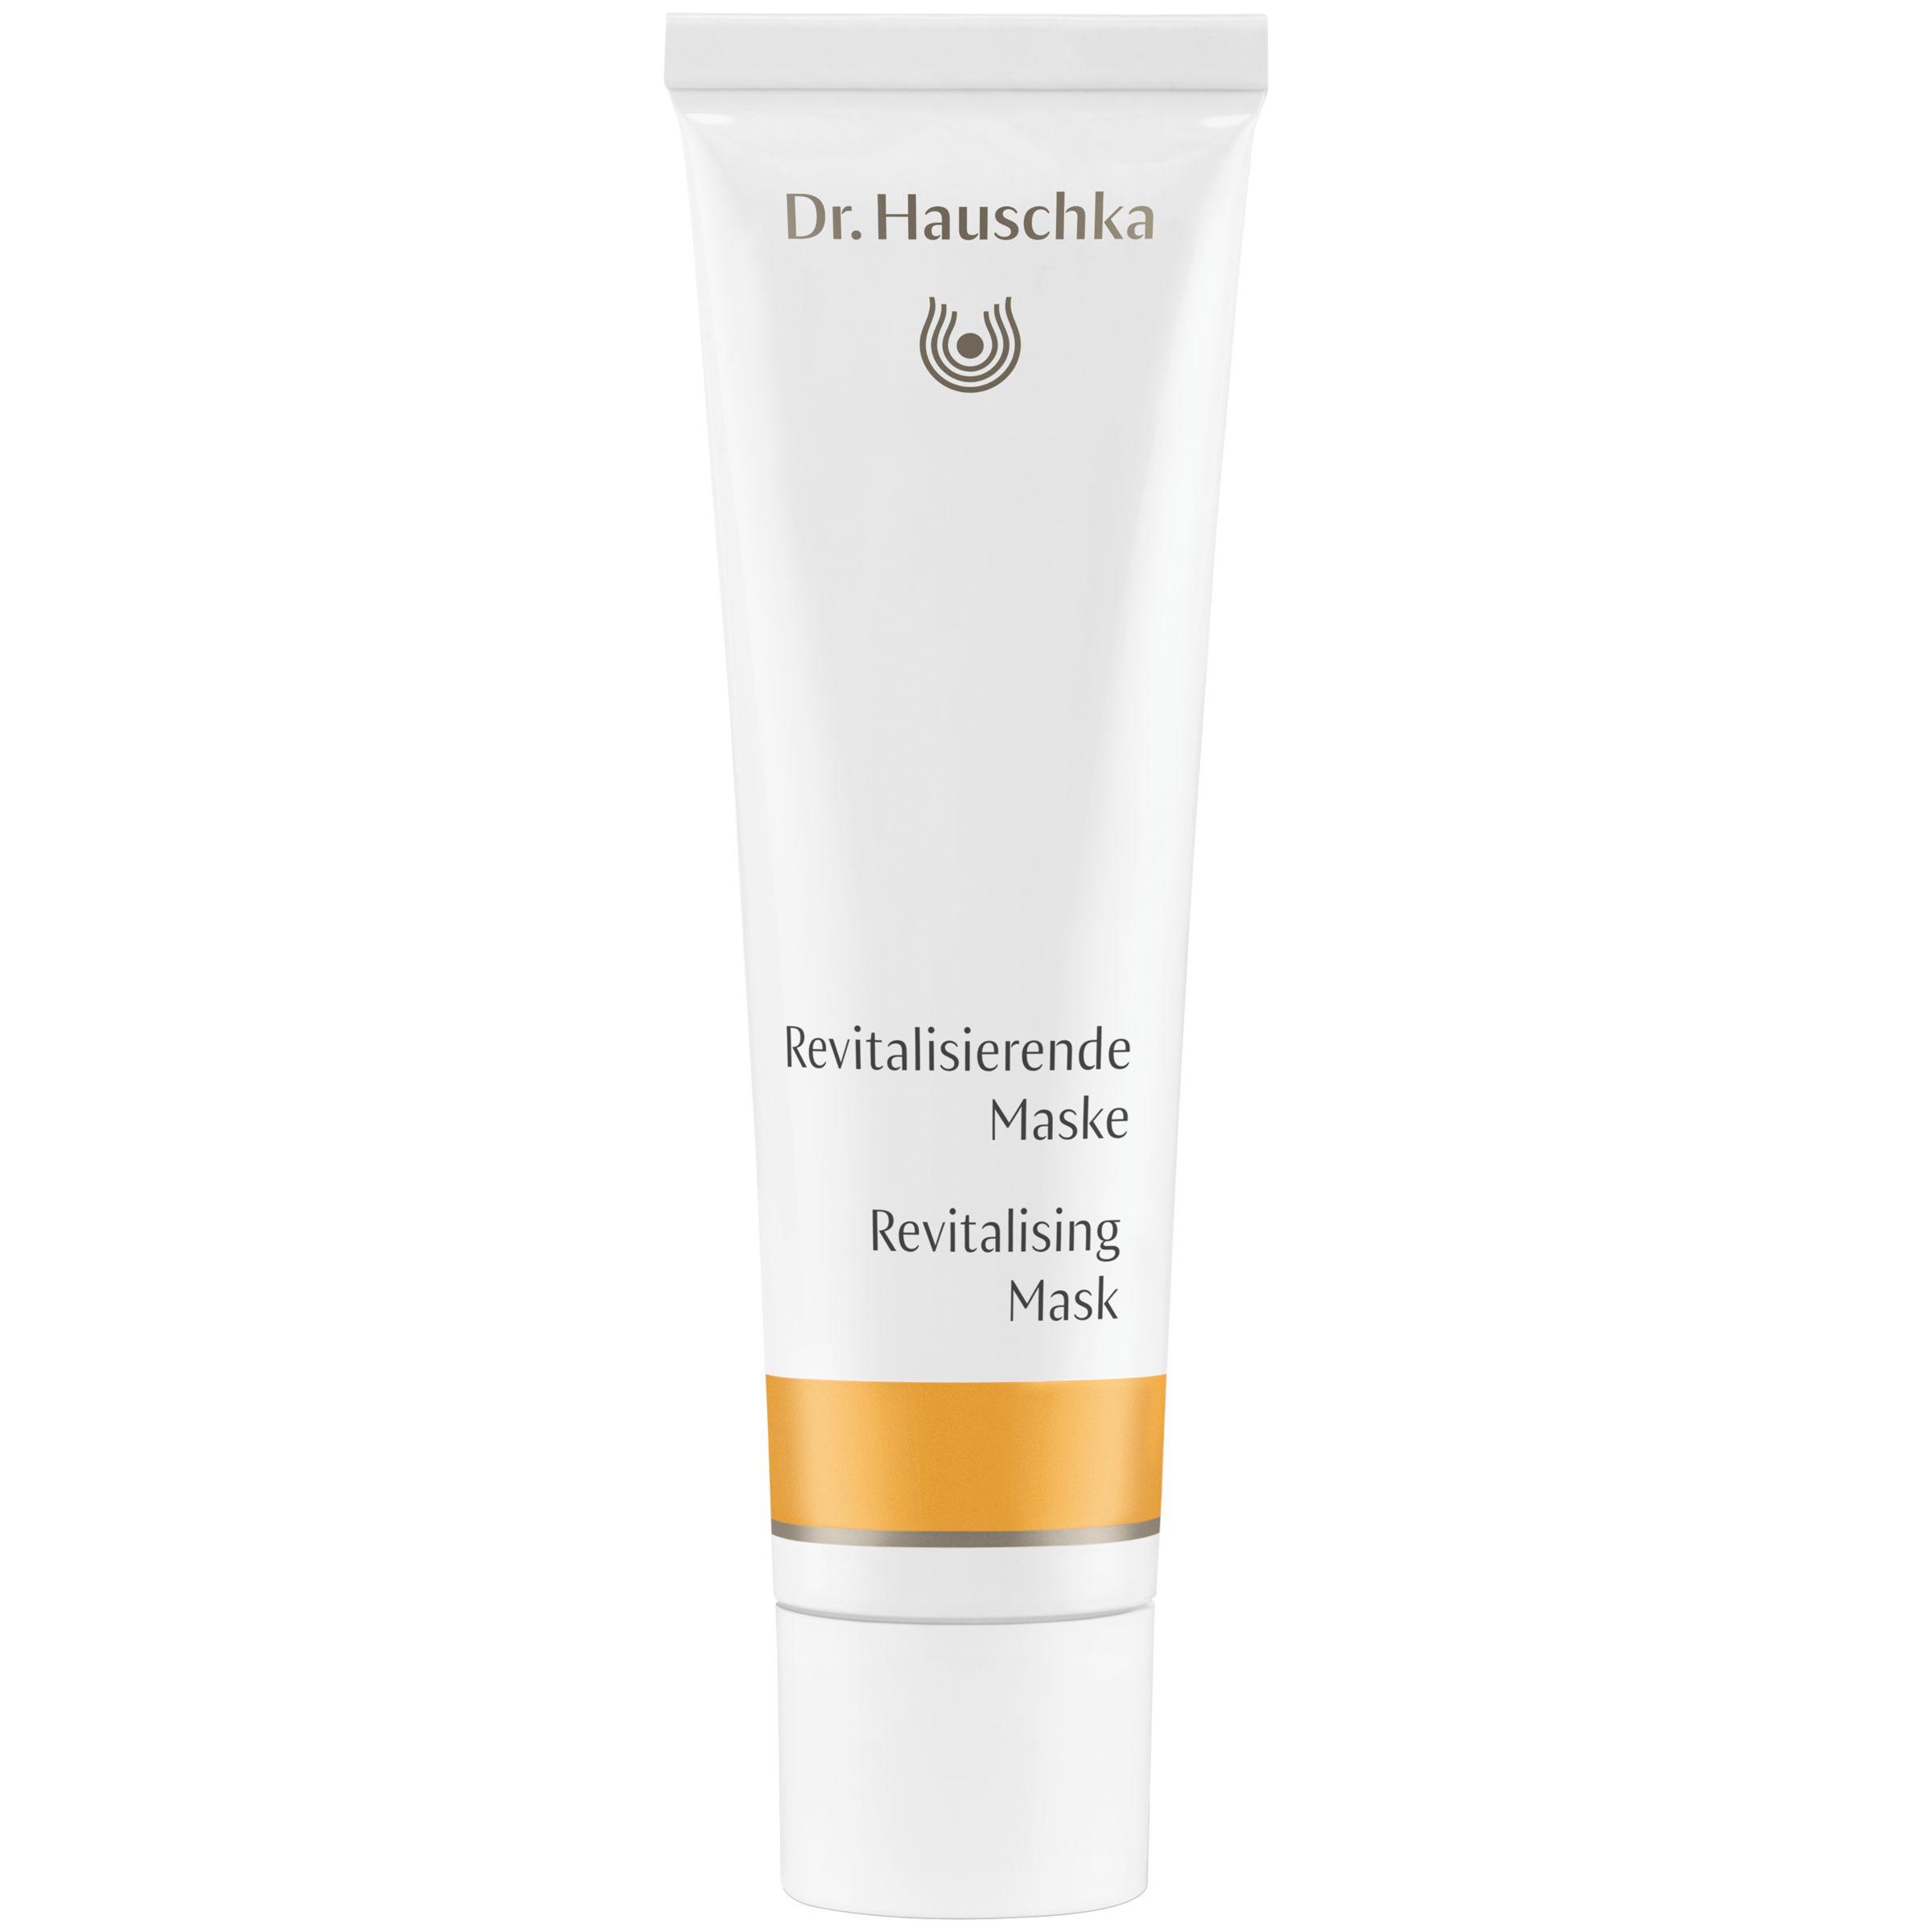 Dr Hauschka Dr Hauschka Revitalising Mask, 30ml